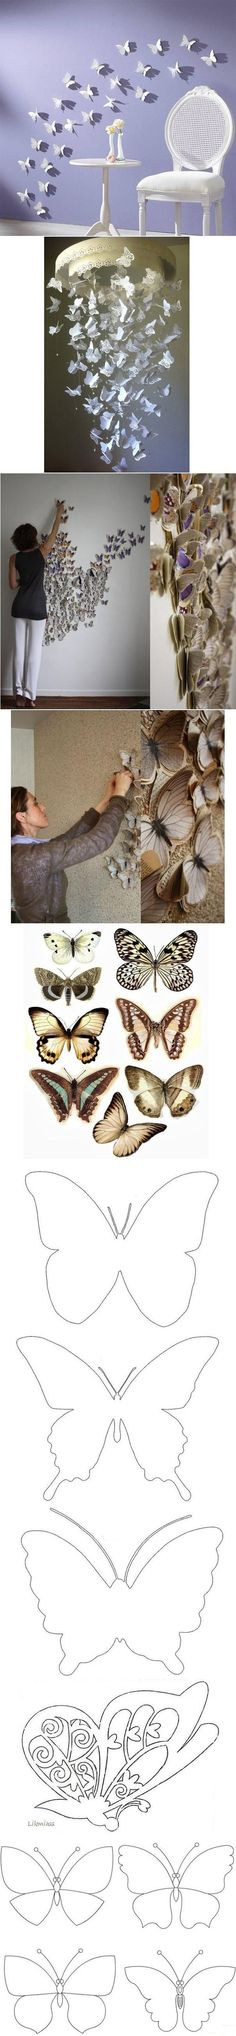 DIY Butterfly Pattern Wall Decor DIY Butterfly Pattern Wall Decor by diyforever Pattern Wall, Wall Patterns, Paper Patterns, Diy Butterfly, Butterfly Pattern, Butterfly Mobile, Butterfly Shape, Butterfly Template, Butterfly Design